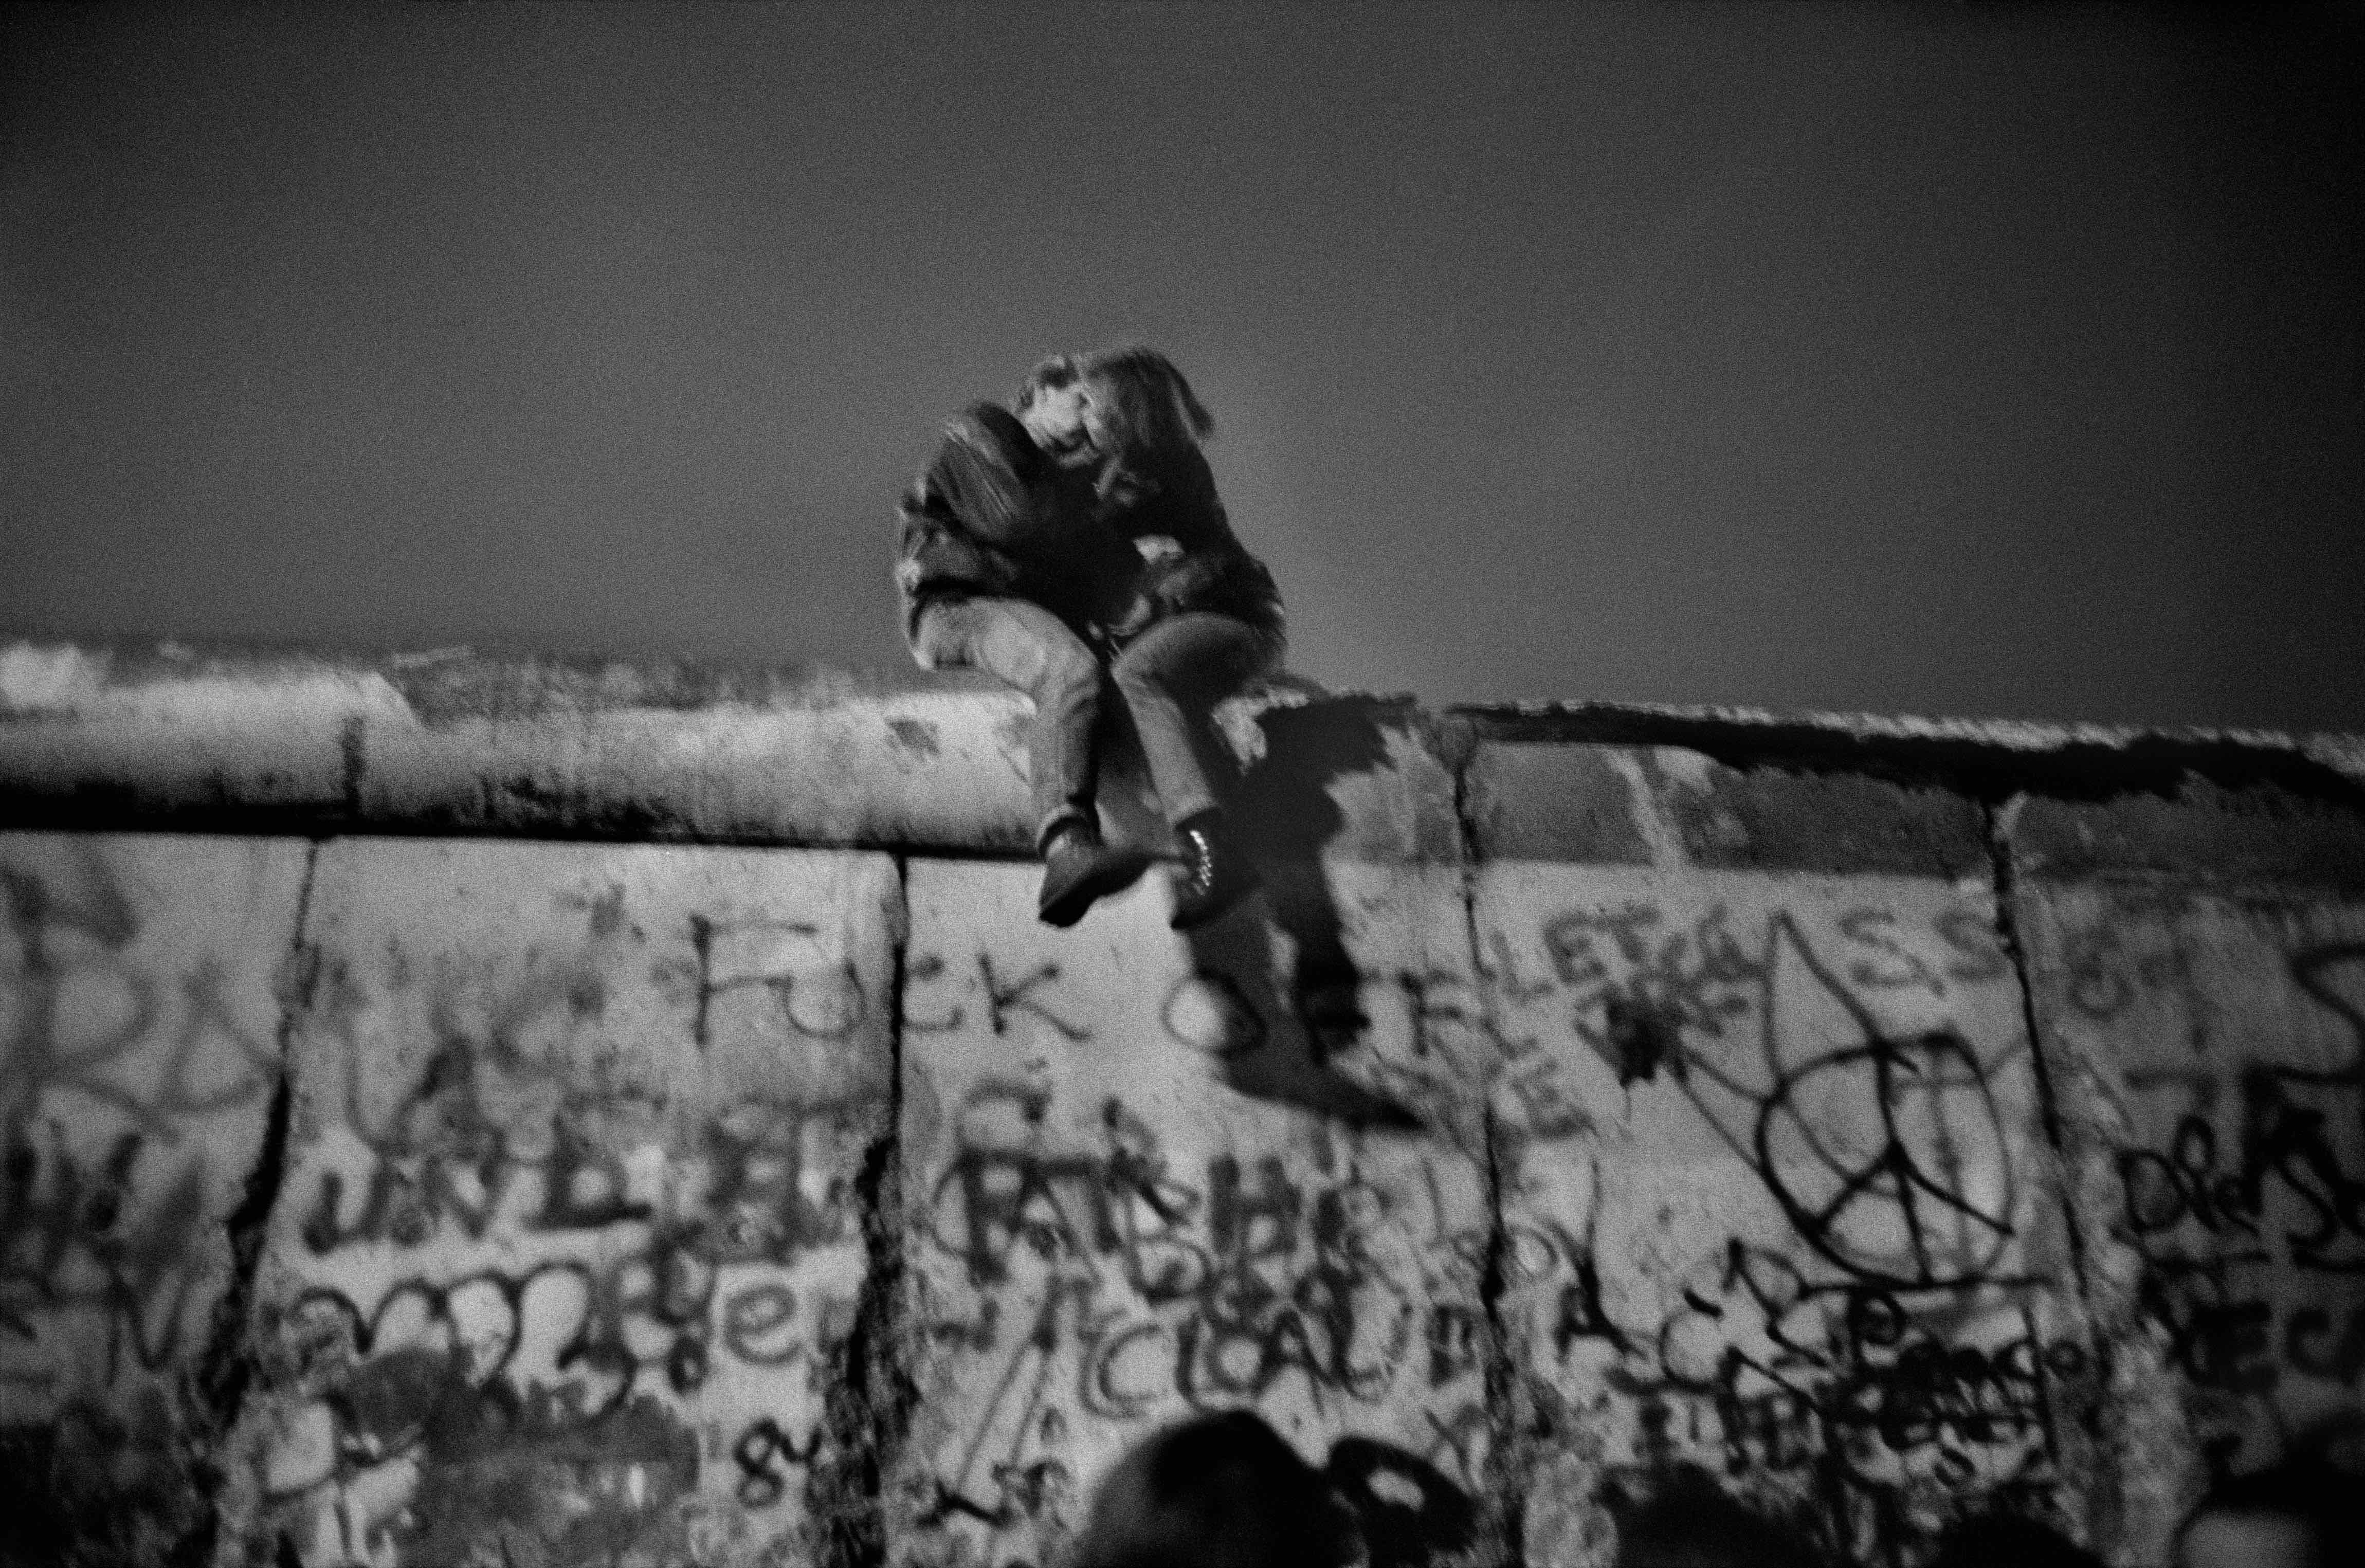 Berlin Wall. Sunday, December 31, 1989 © Guy Le Querrec